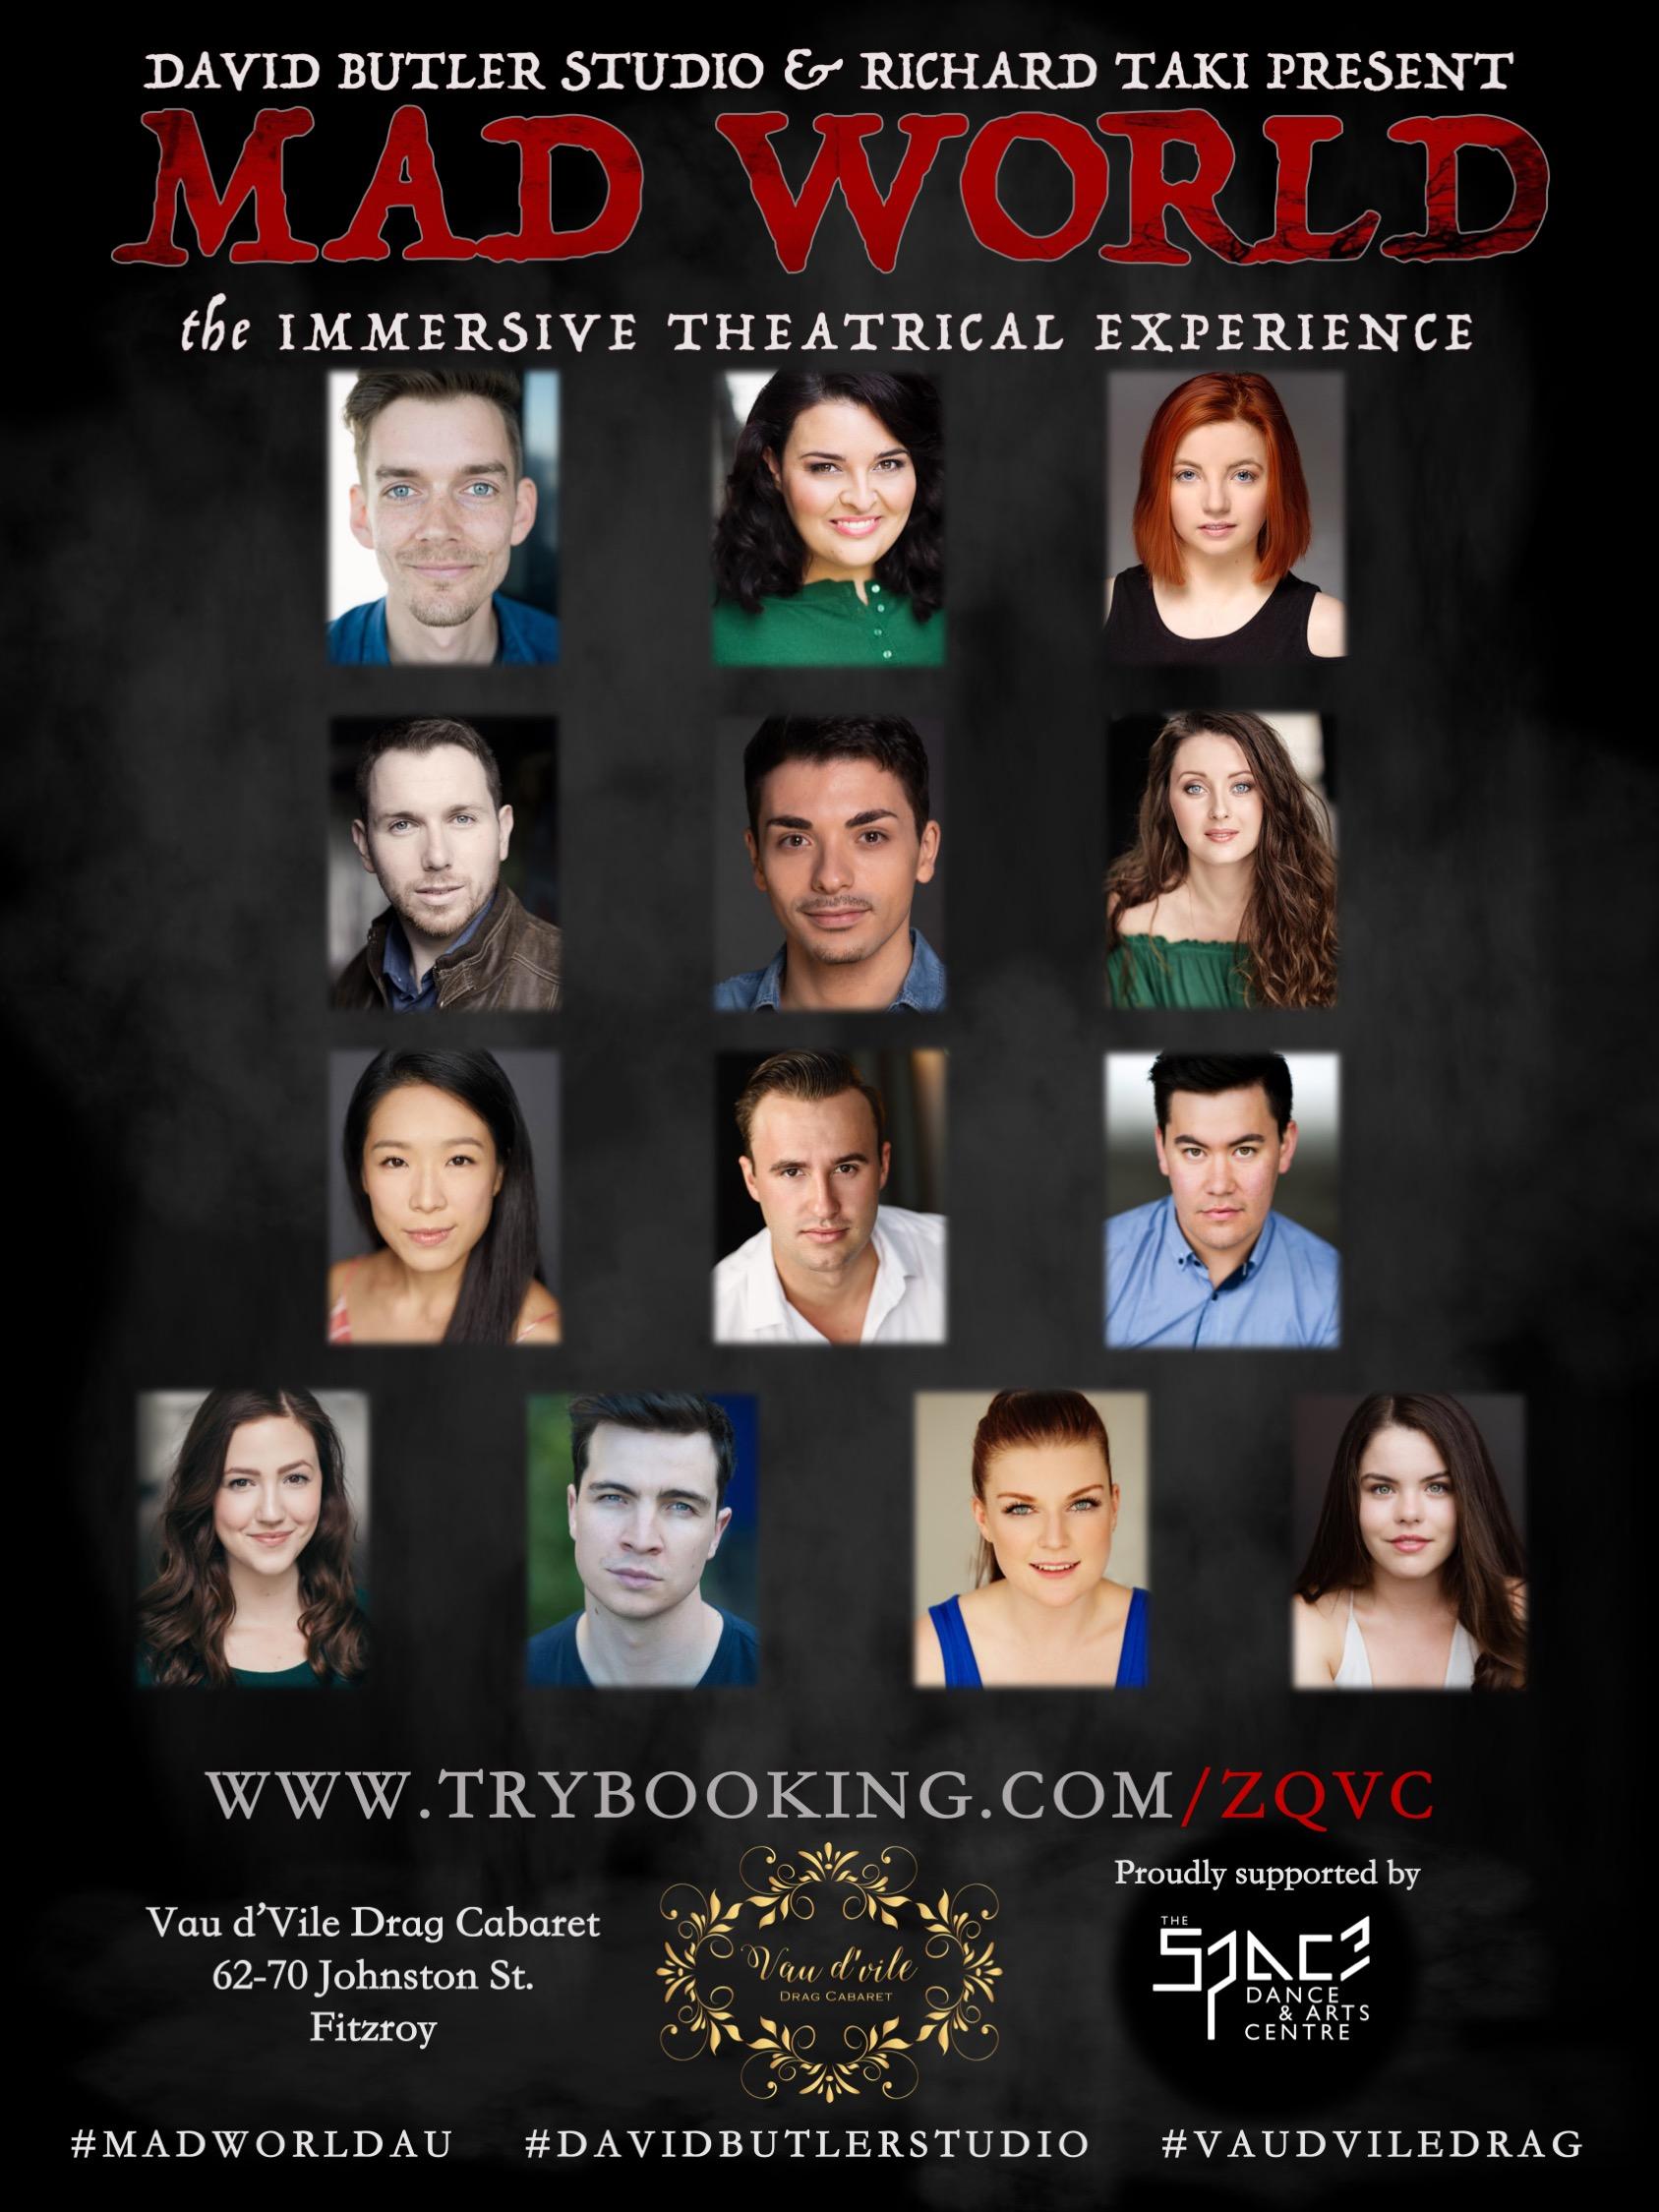 MW2 Cast Announcement Poster.jpg